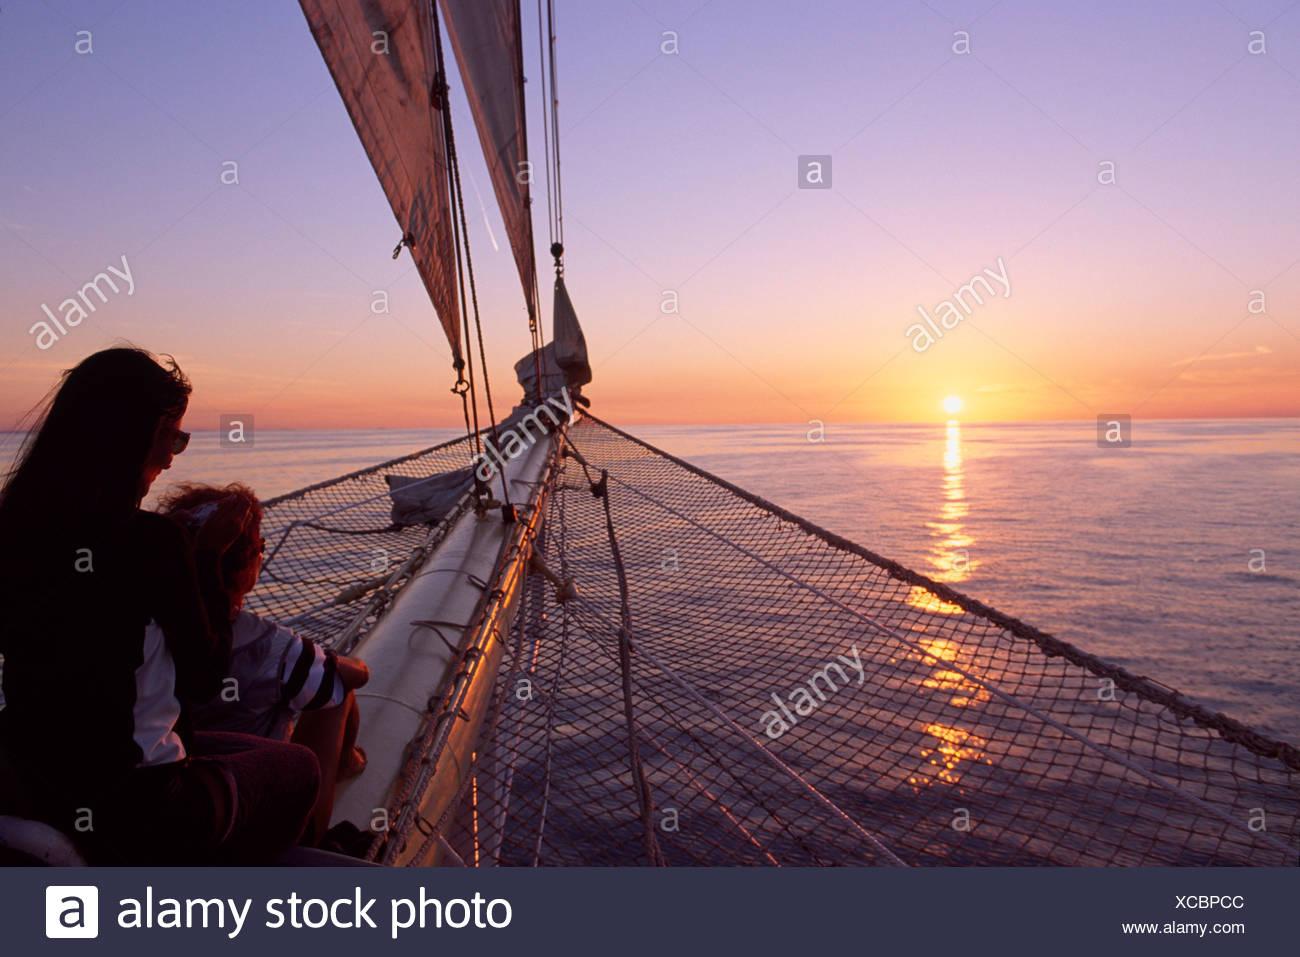 Sunset, sailing ship, Star Flyer, Dalmatia, Dalmatian Coast, Croatia - Stock Image